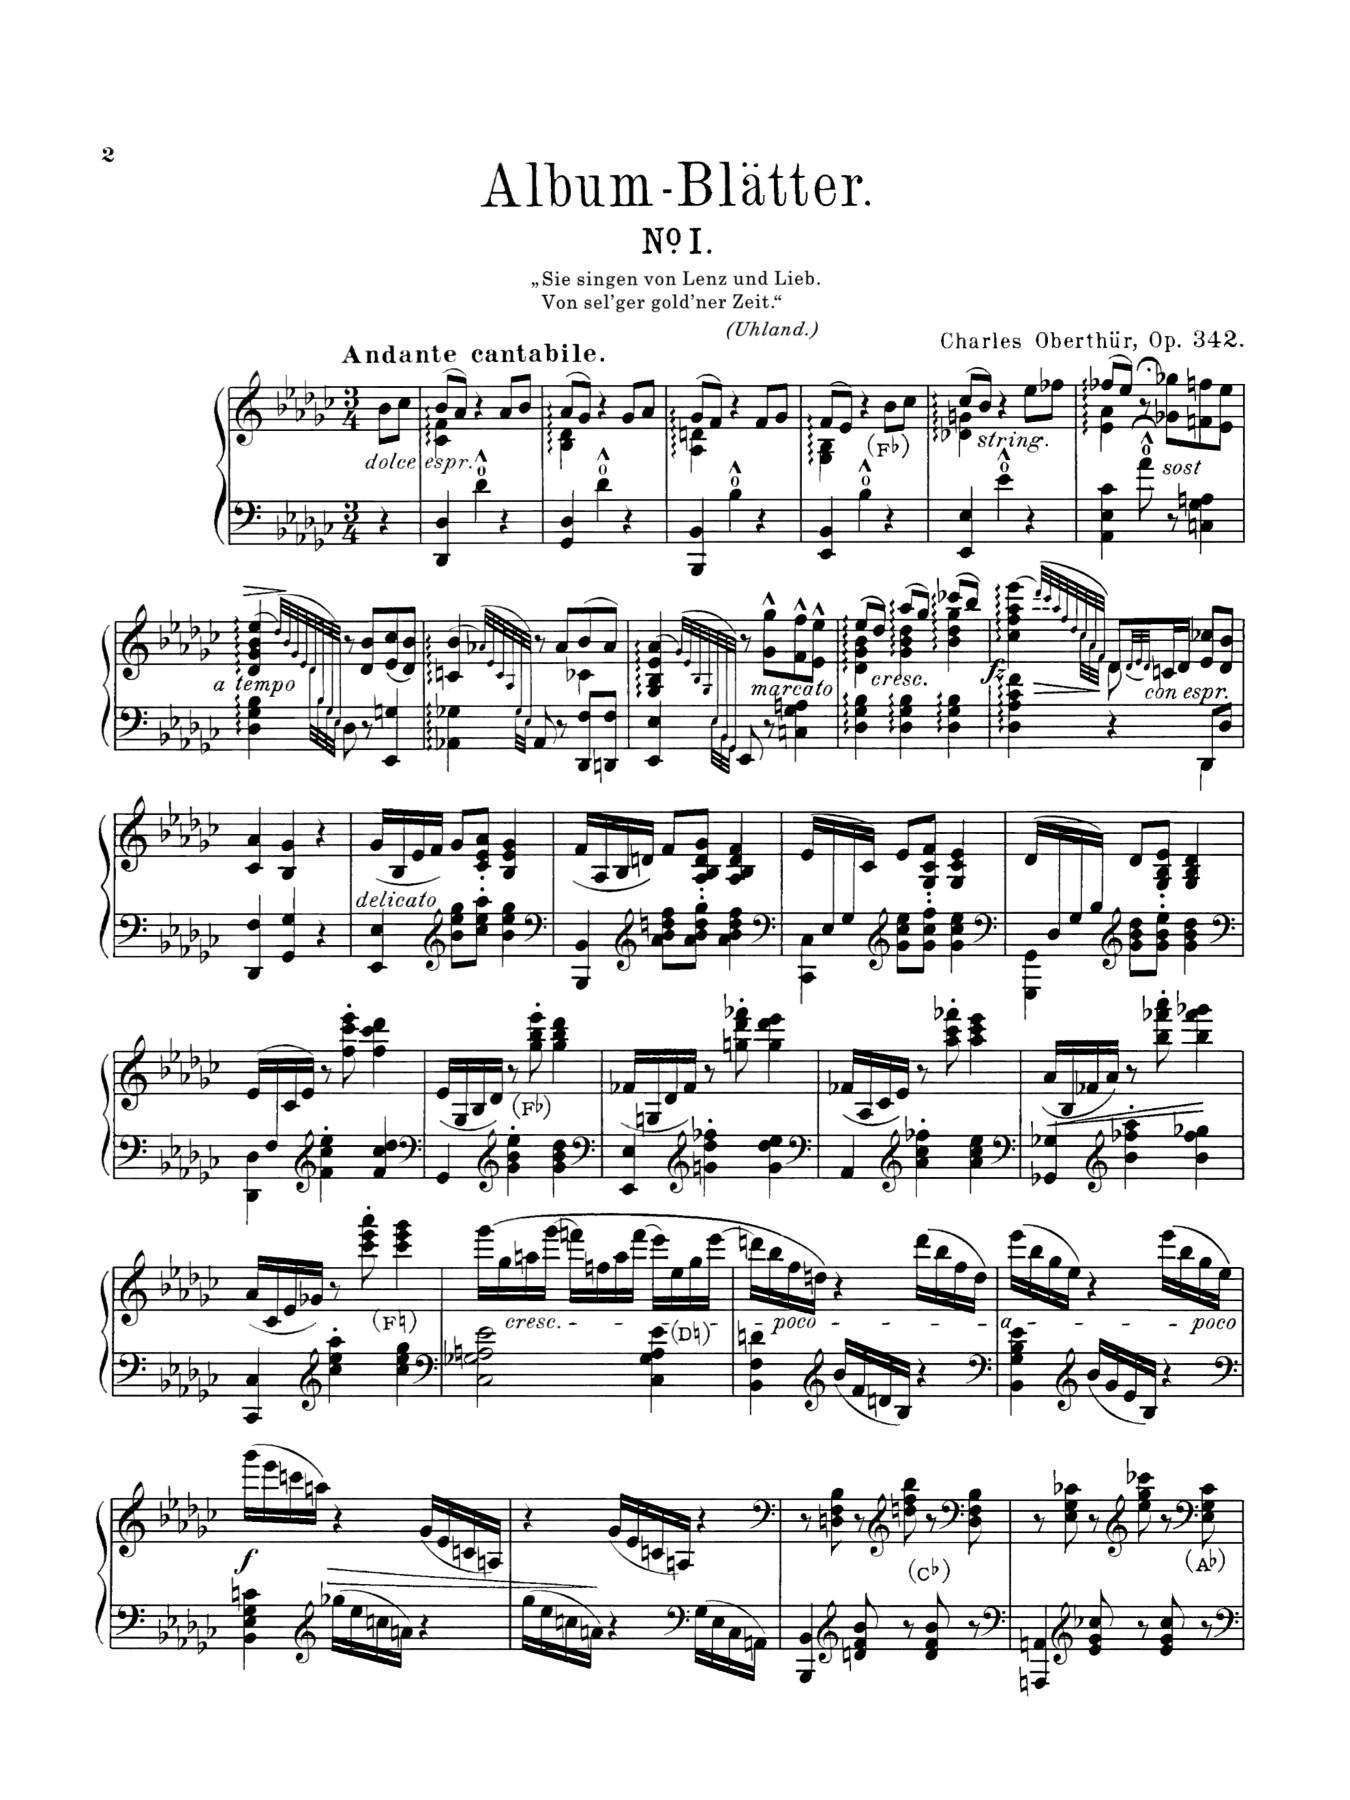 Oberthur Albumblatter op 342 page 1